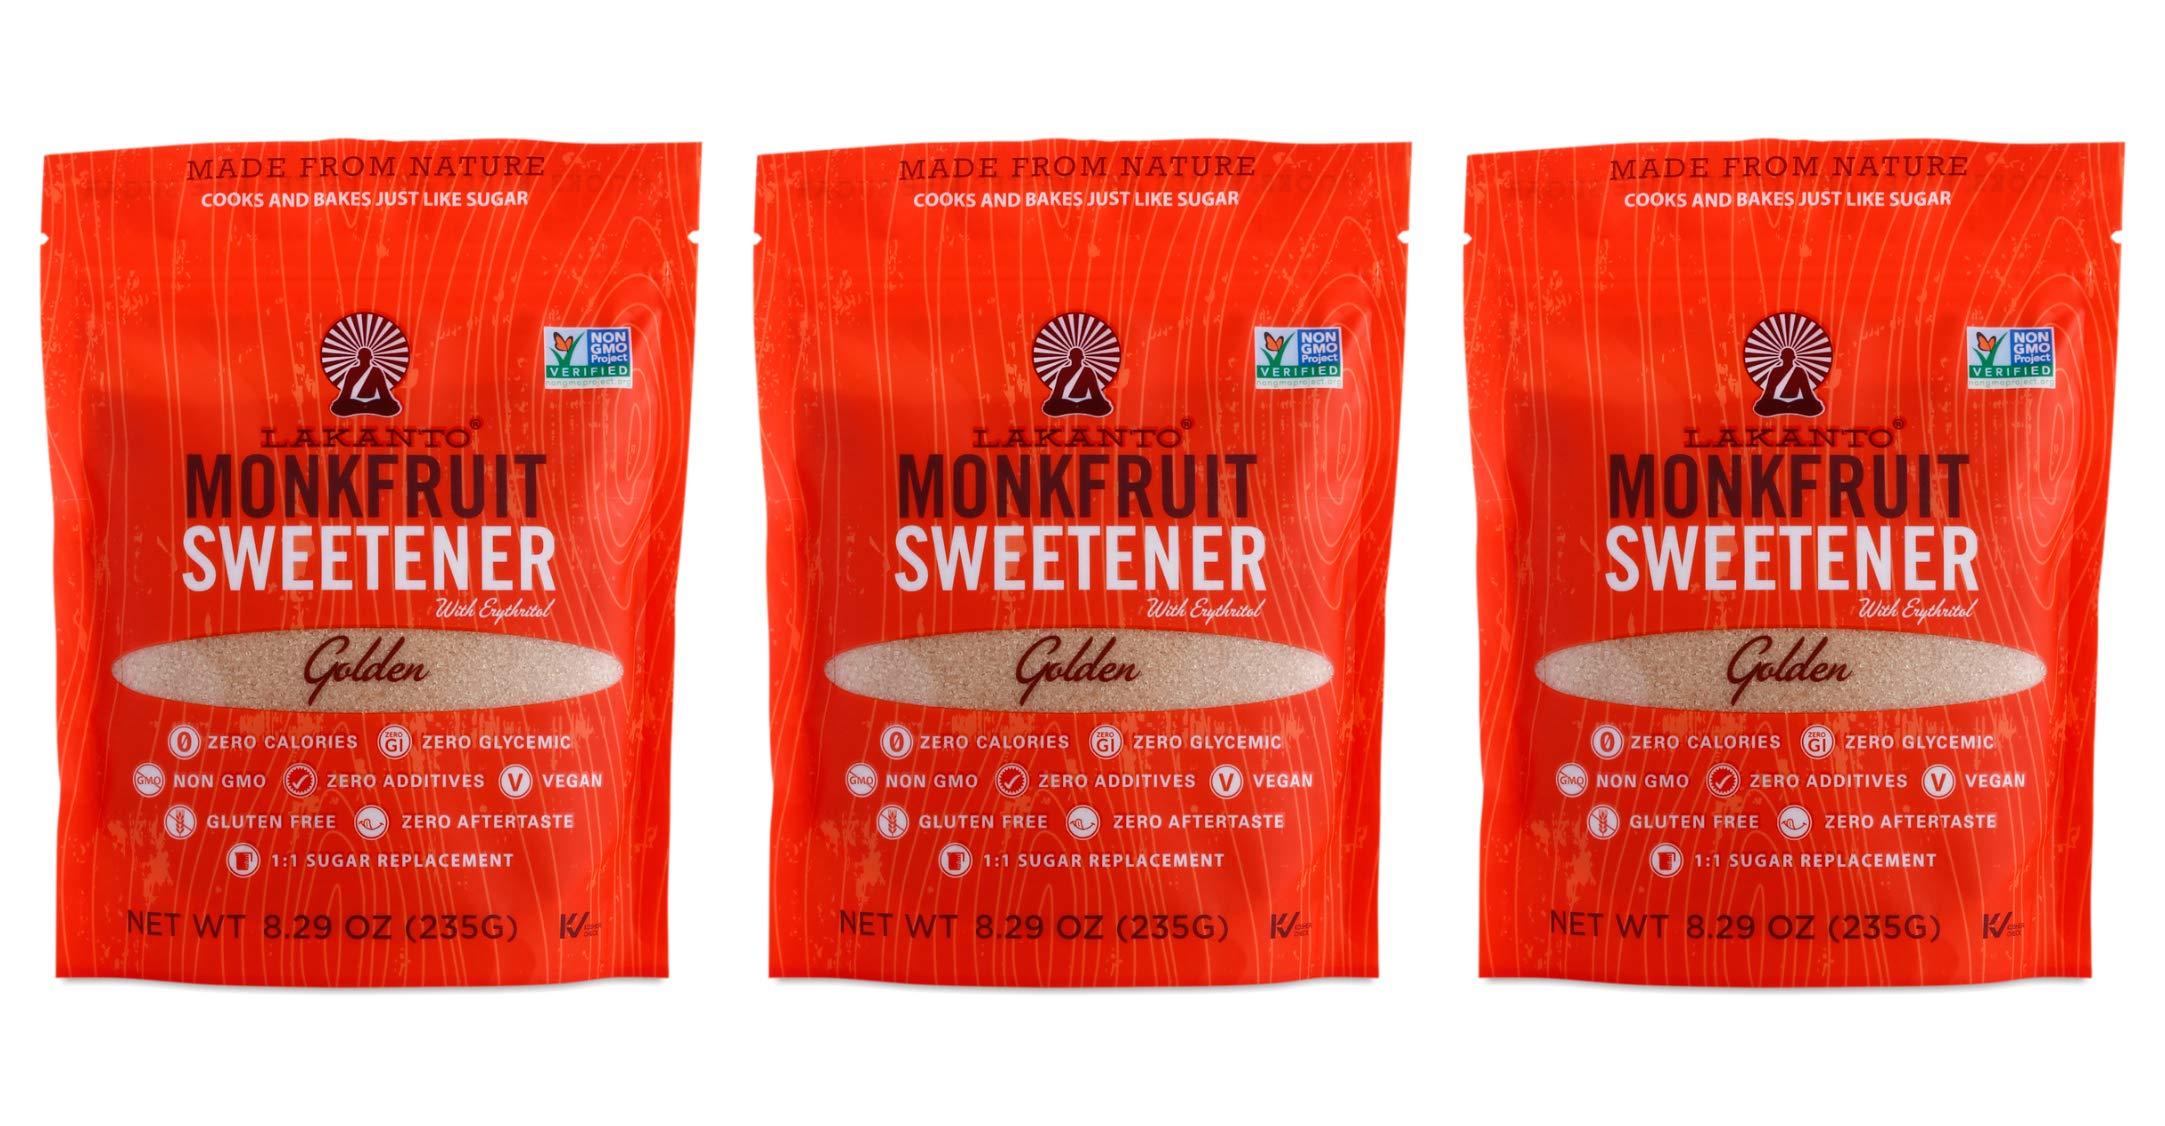 Lakanto Monkfruit 1:1 Sugar Substitute, NON GMO, Golden, 8.29 oz (235 g) Pack Of 3